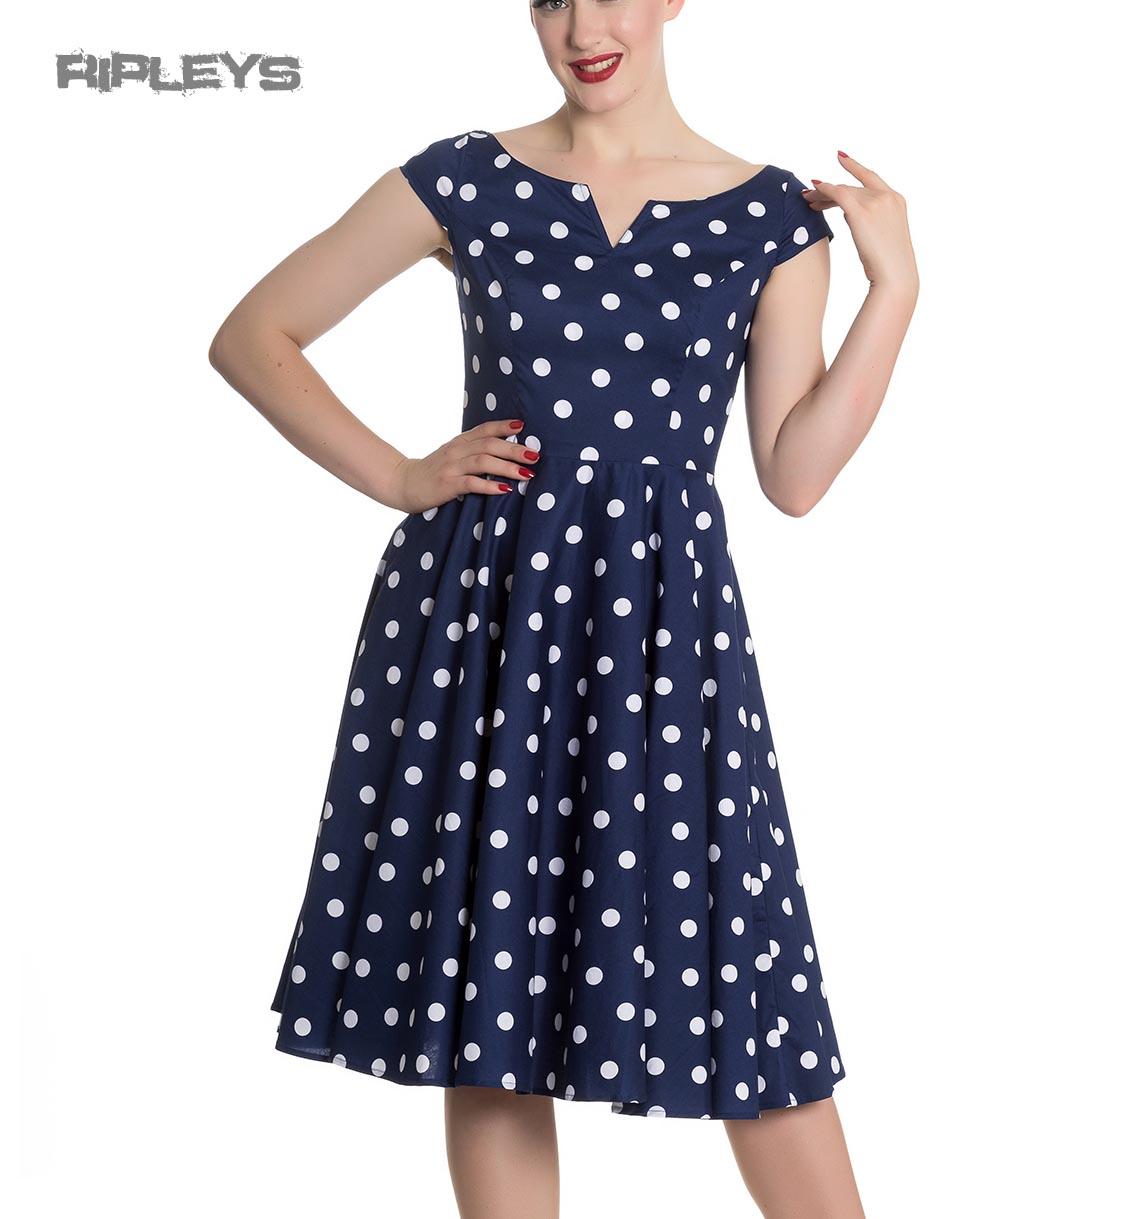 Hell-Bunny-50s-Dress-Polka-Dot-NICKY-Pin-Up-Rockabilly-Navy-Blue-All-Sizes thumbnail 4